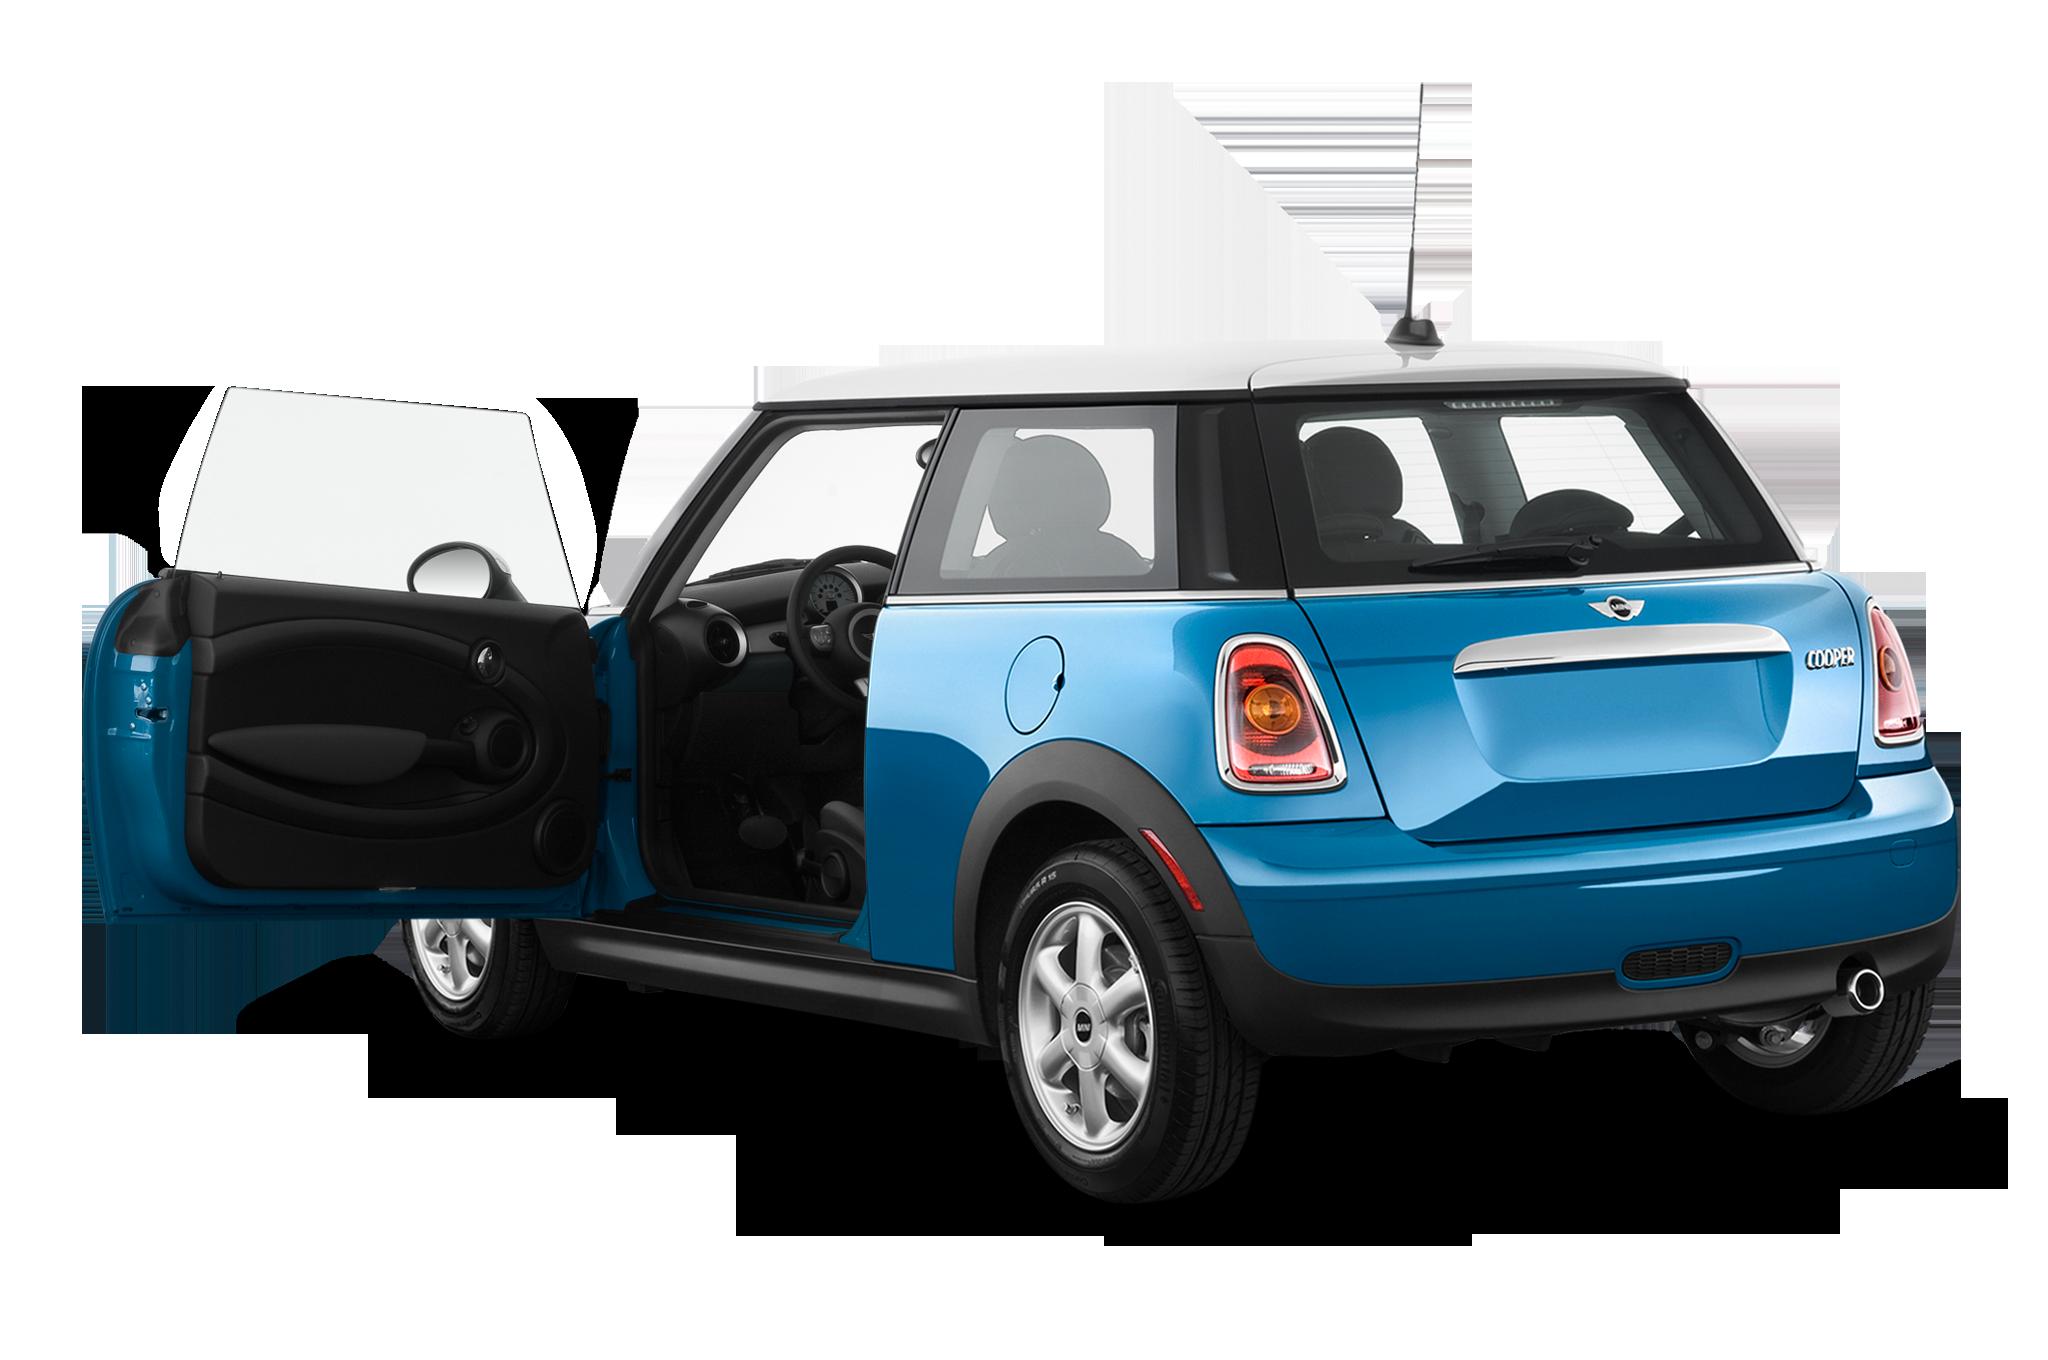 2010 mini john cooper works clubman mini jcw sport wagon review automobile magazine. Black Bedroom Furniture Sets. Home Design Ideas